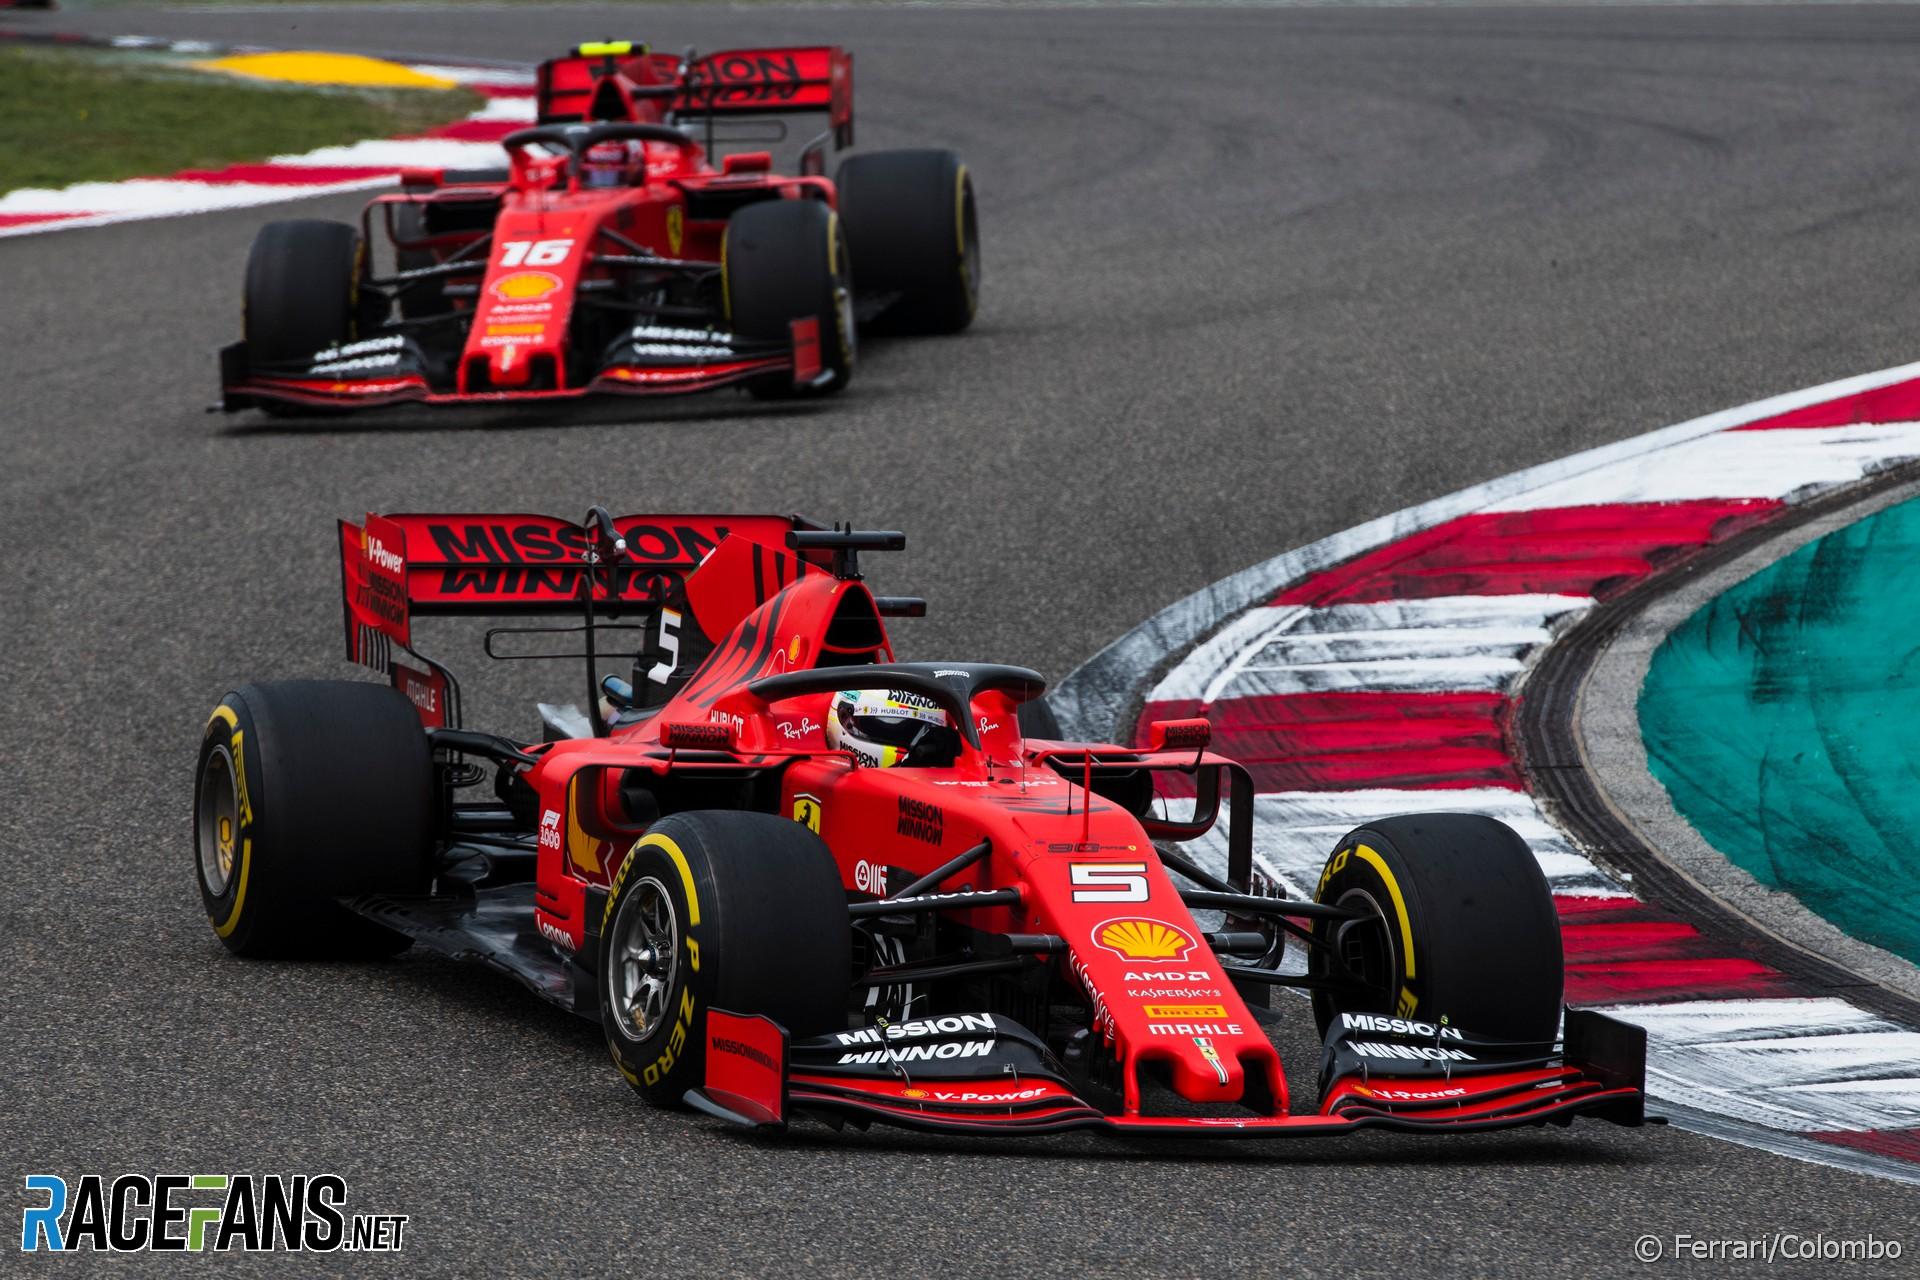 Sebastian Vettel, Ferrari, Shanghai International Circuit, 2019